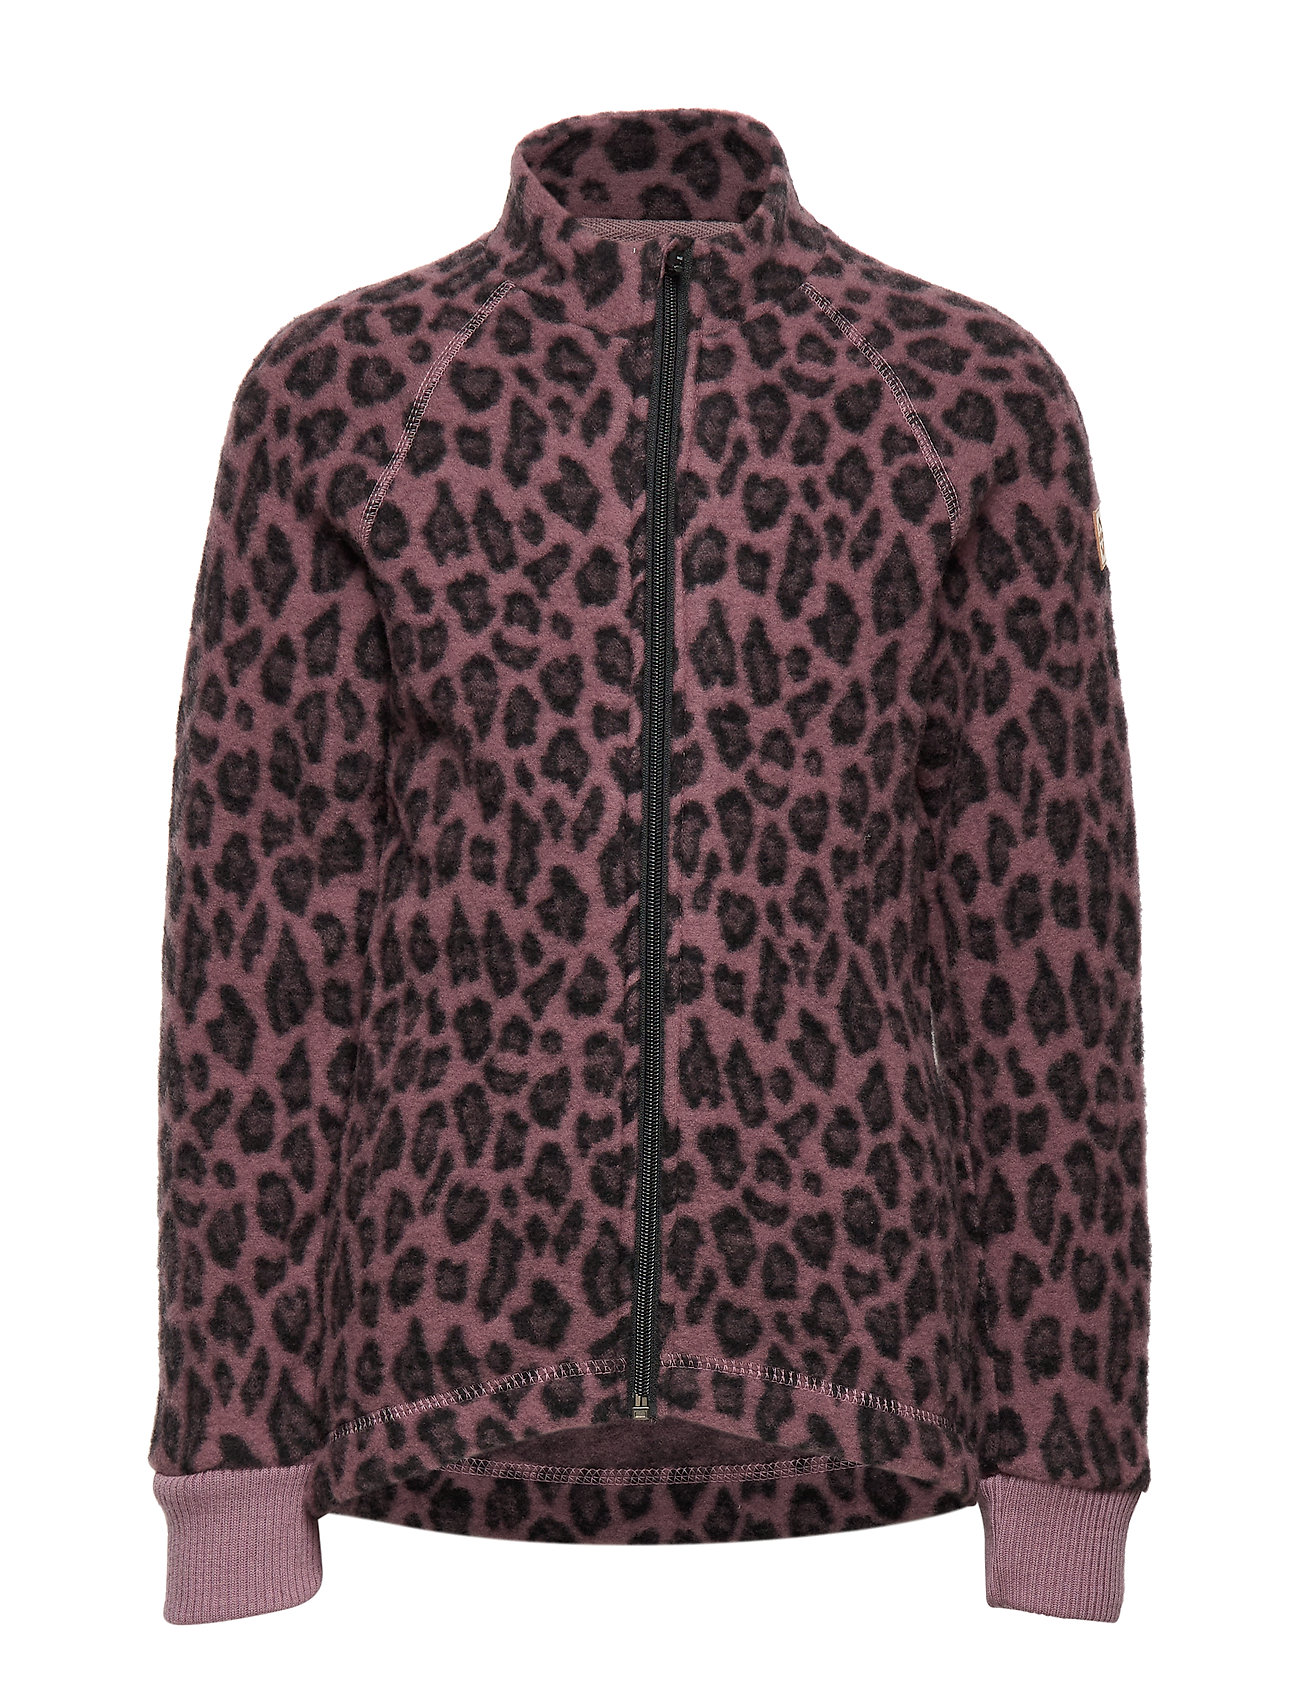 Mikk-Line WOOL Jacquard Jacket - ROSE TAUPE